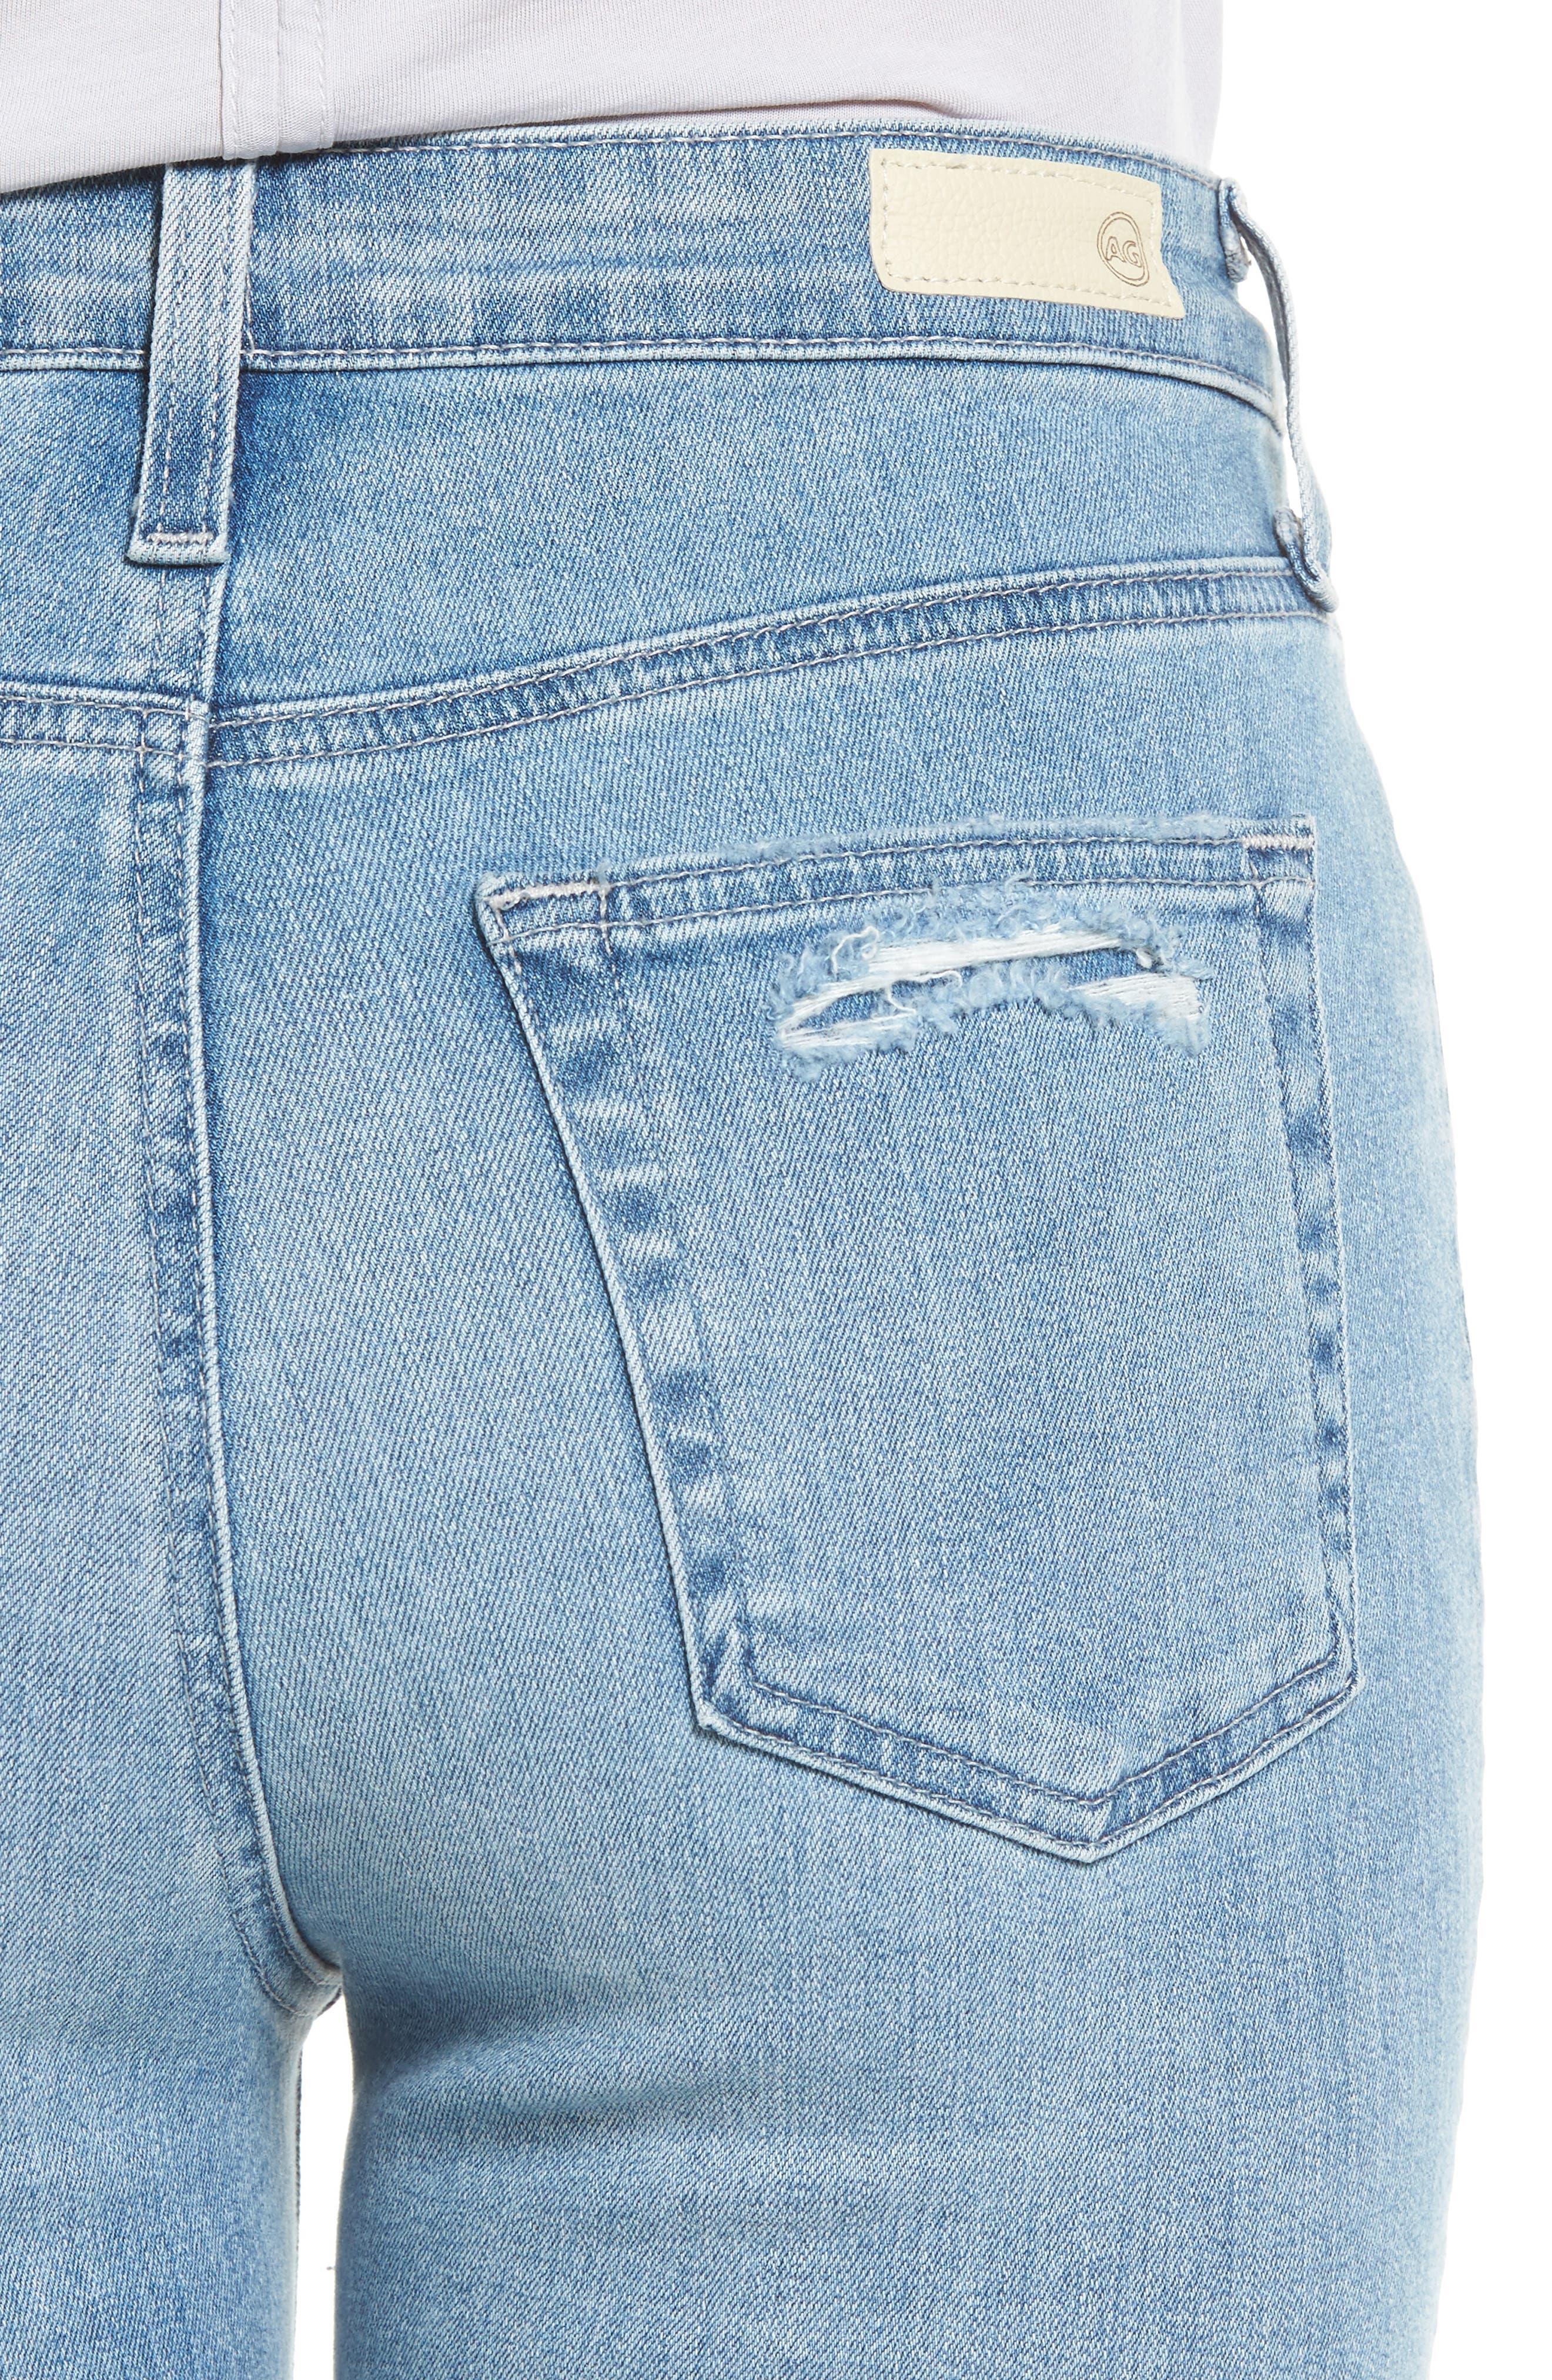 Mila High Waist Ankle Skinny Jeans,                             Alternate thumbnail 4, color,                             20 Years-Oceana Destructed